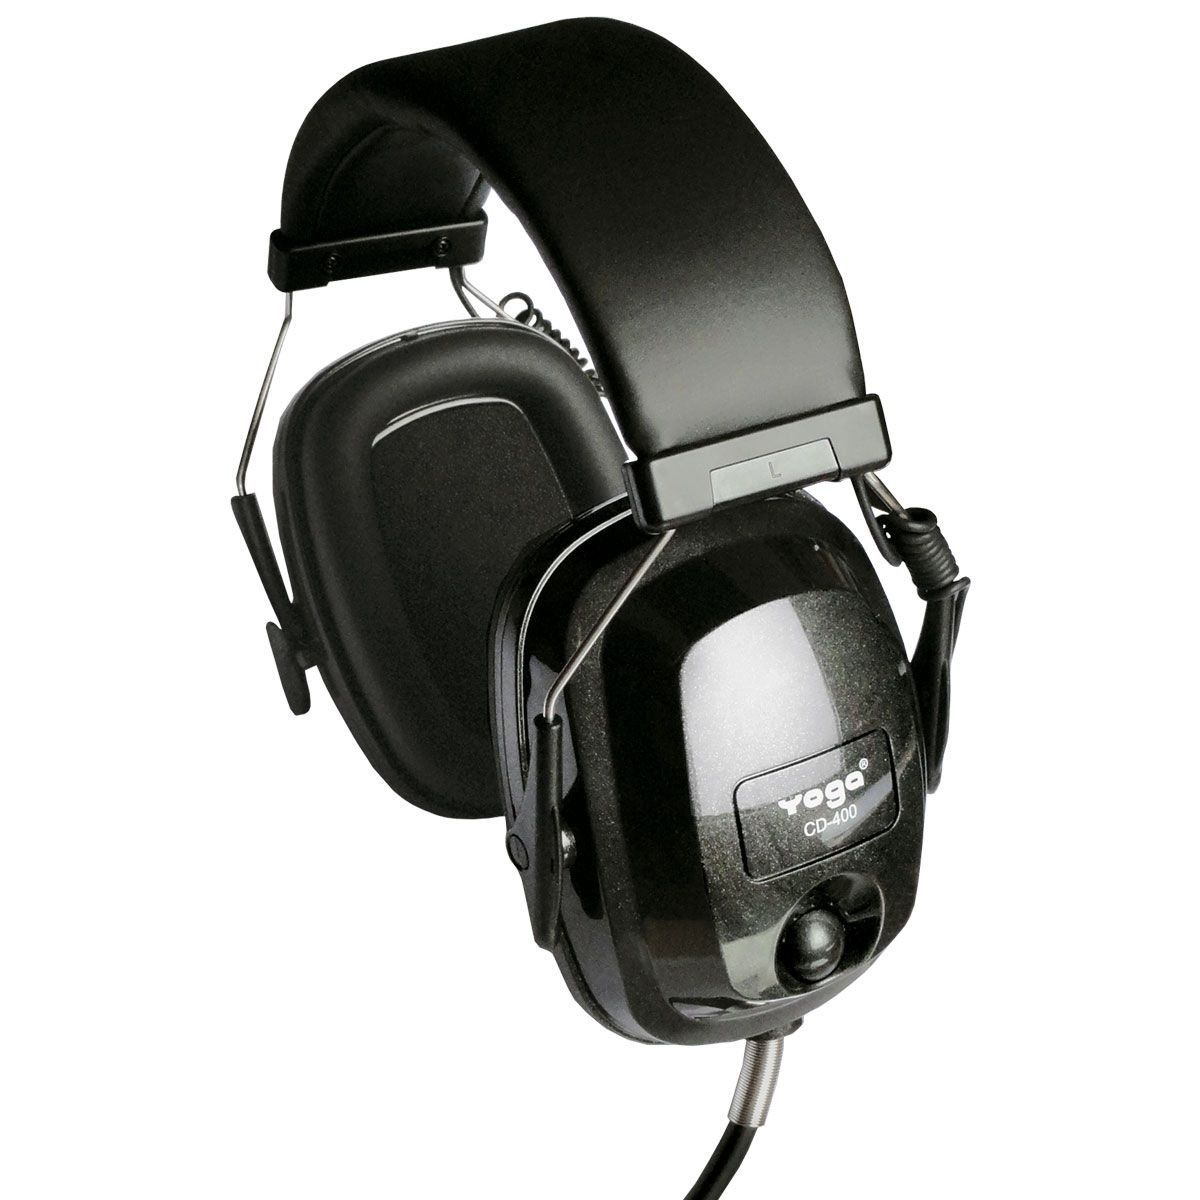 Fone de Ouvido Over-ear 10HZ/20KHZ 32 OHMS Driver Neodímio CD 400 - Yoga